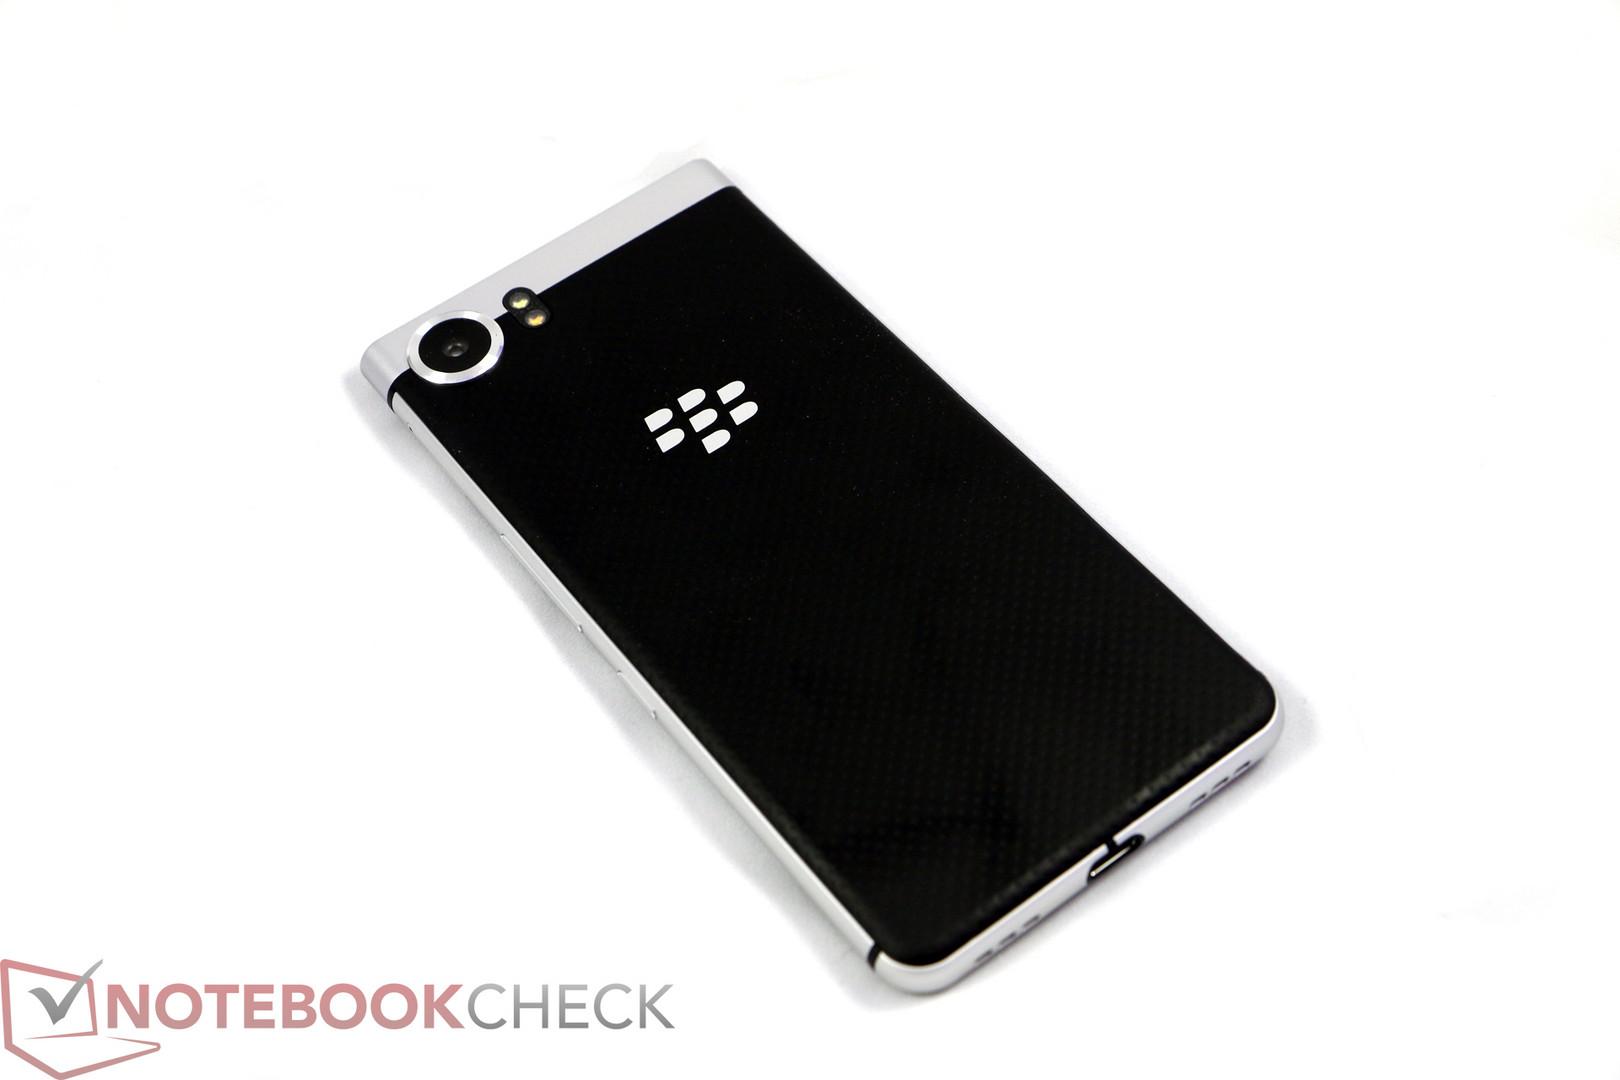 Samsung Galaxy Note Pro 122 P901 32 Gb Putih5 Daftar Harga Terbaru Promo Gila 5 Hp Smartphone Handphone Source Blackberry Keyone